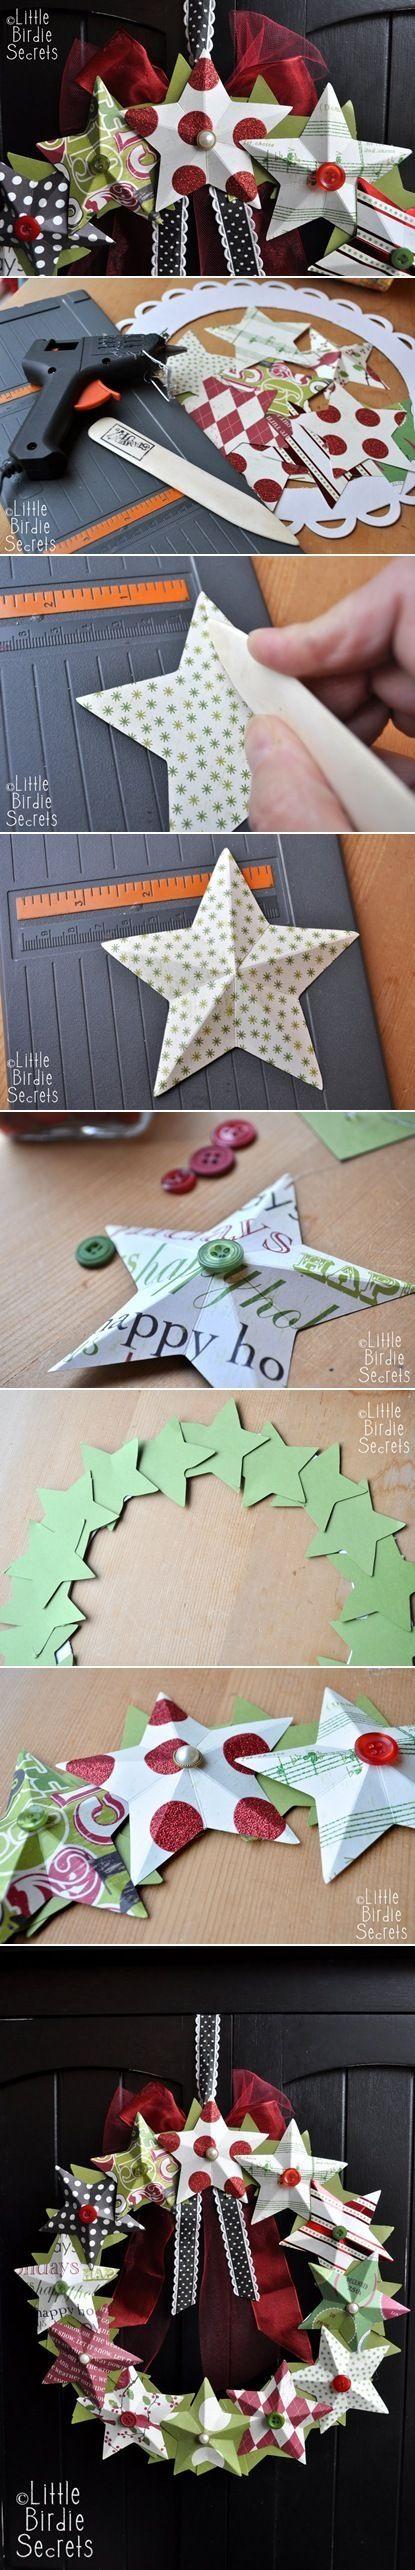 3D paper star wreath tutorial by purpleAMJ